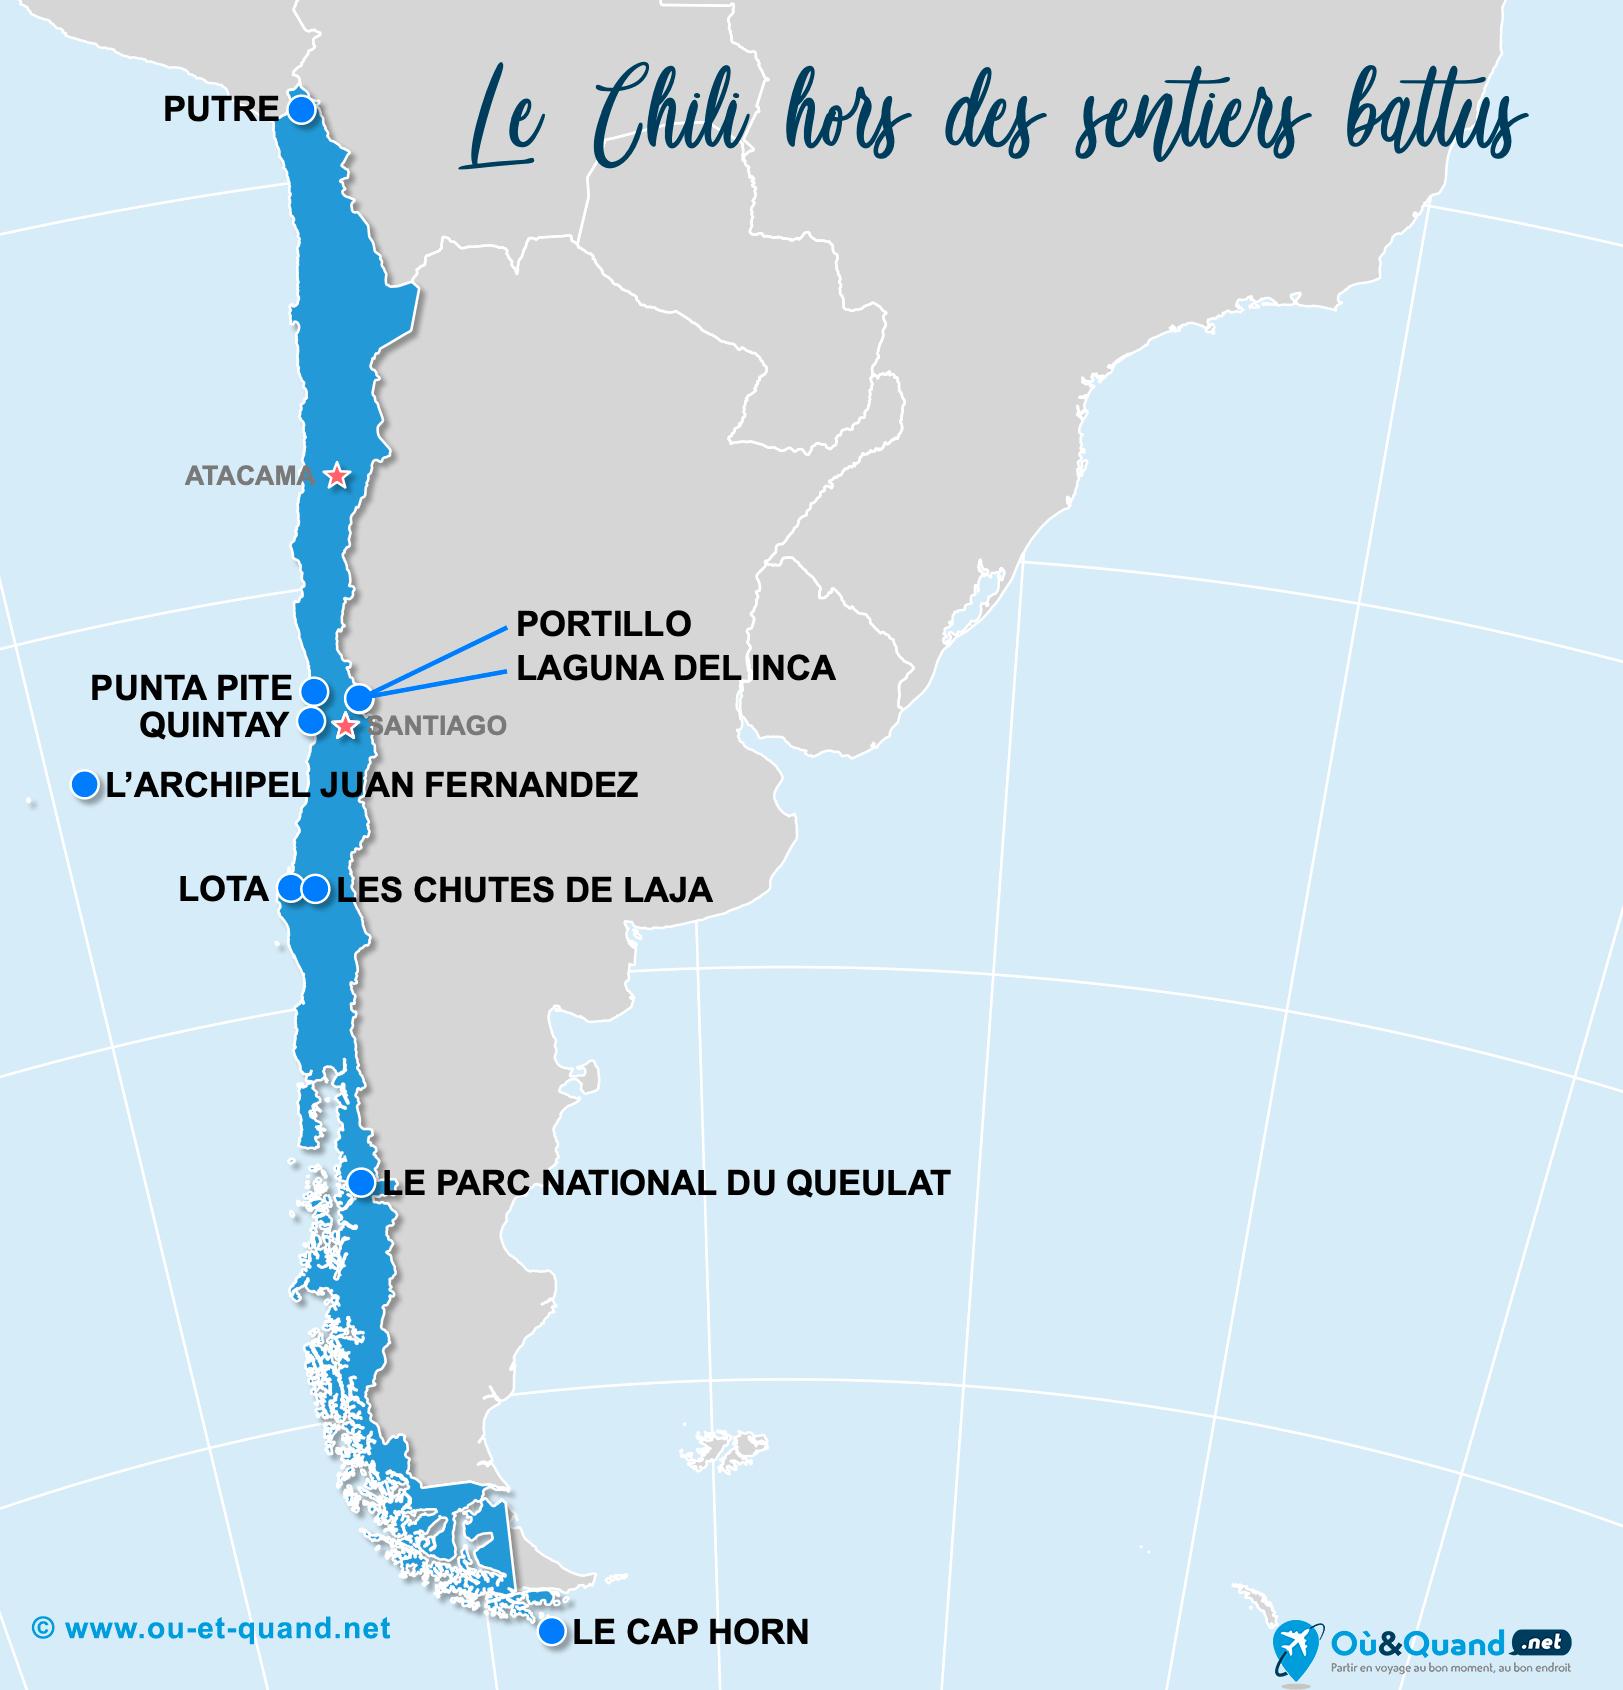 Carte Chili : Le Chili hors des sentiers battus